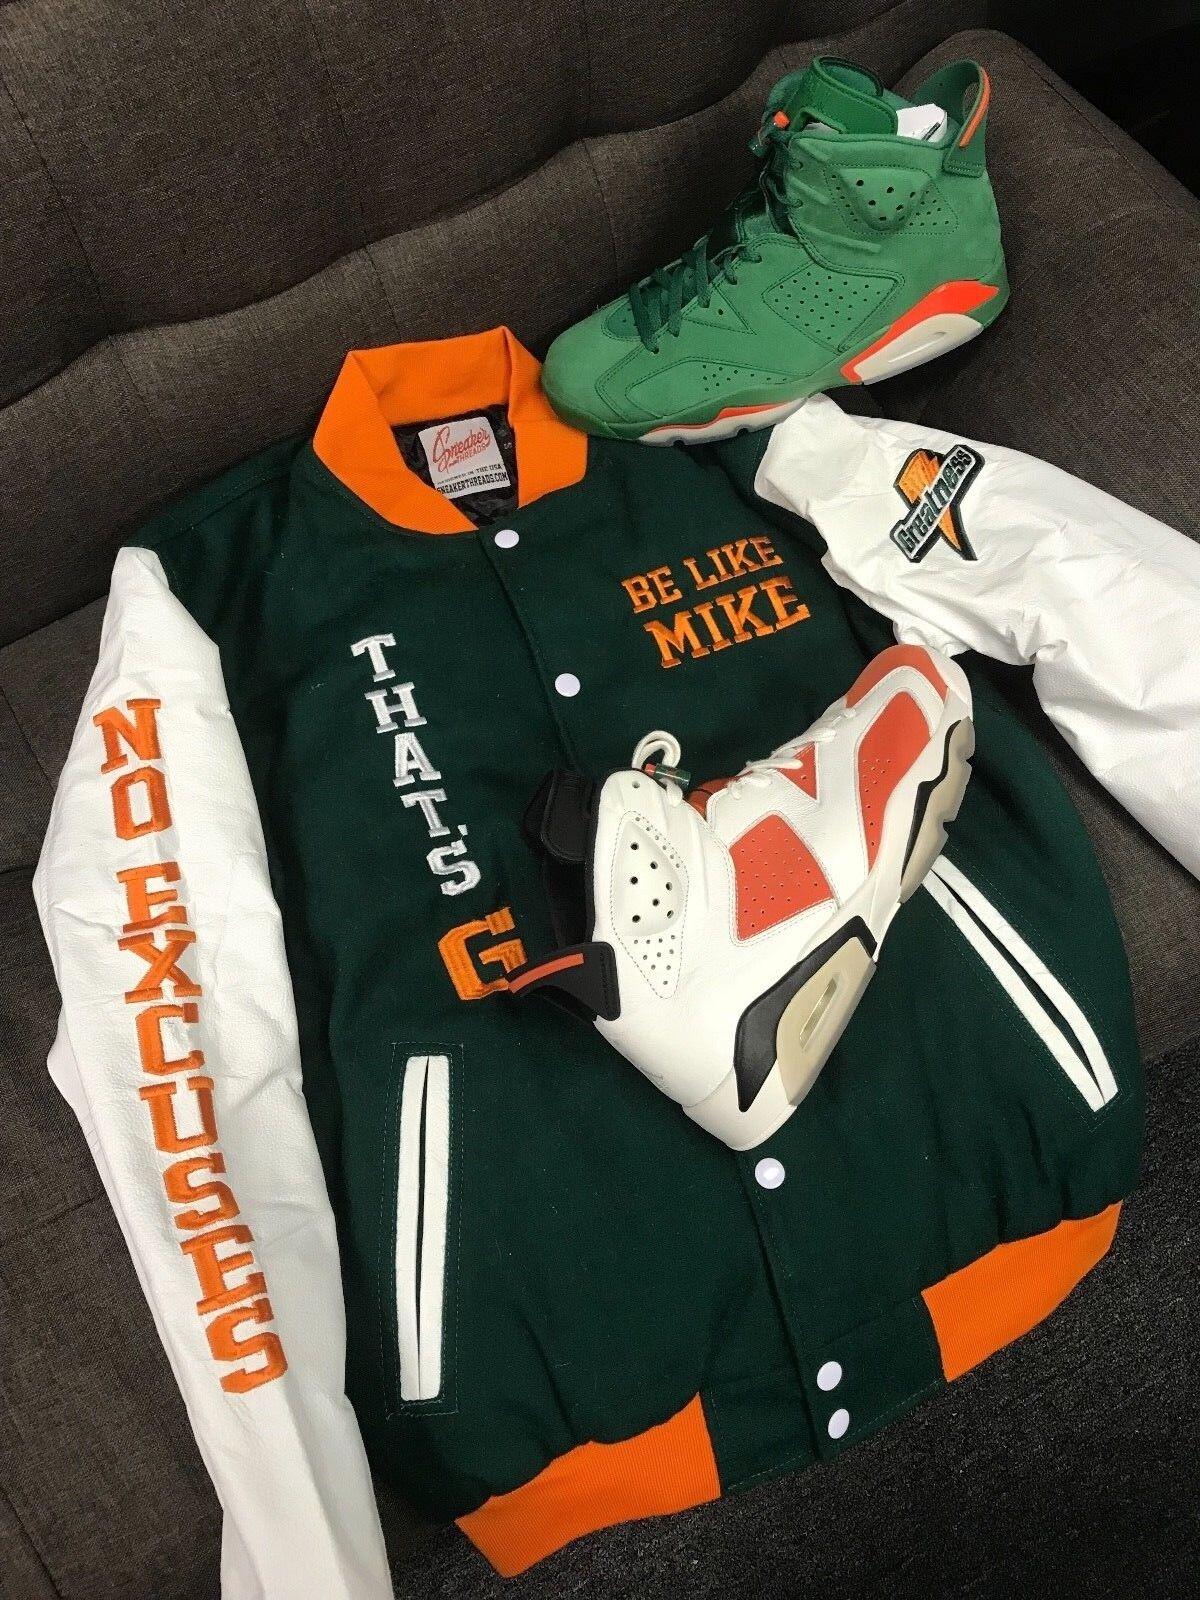 c071bf3d49a48 Мужская верхняя одежда из овчины Leather Varsity Jacket Match Jordan 6  Gatorade Win Like Mike - Greatness Jacket